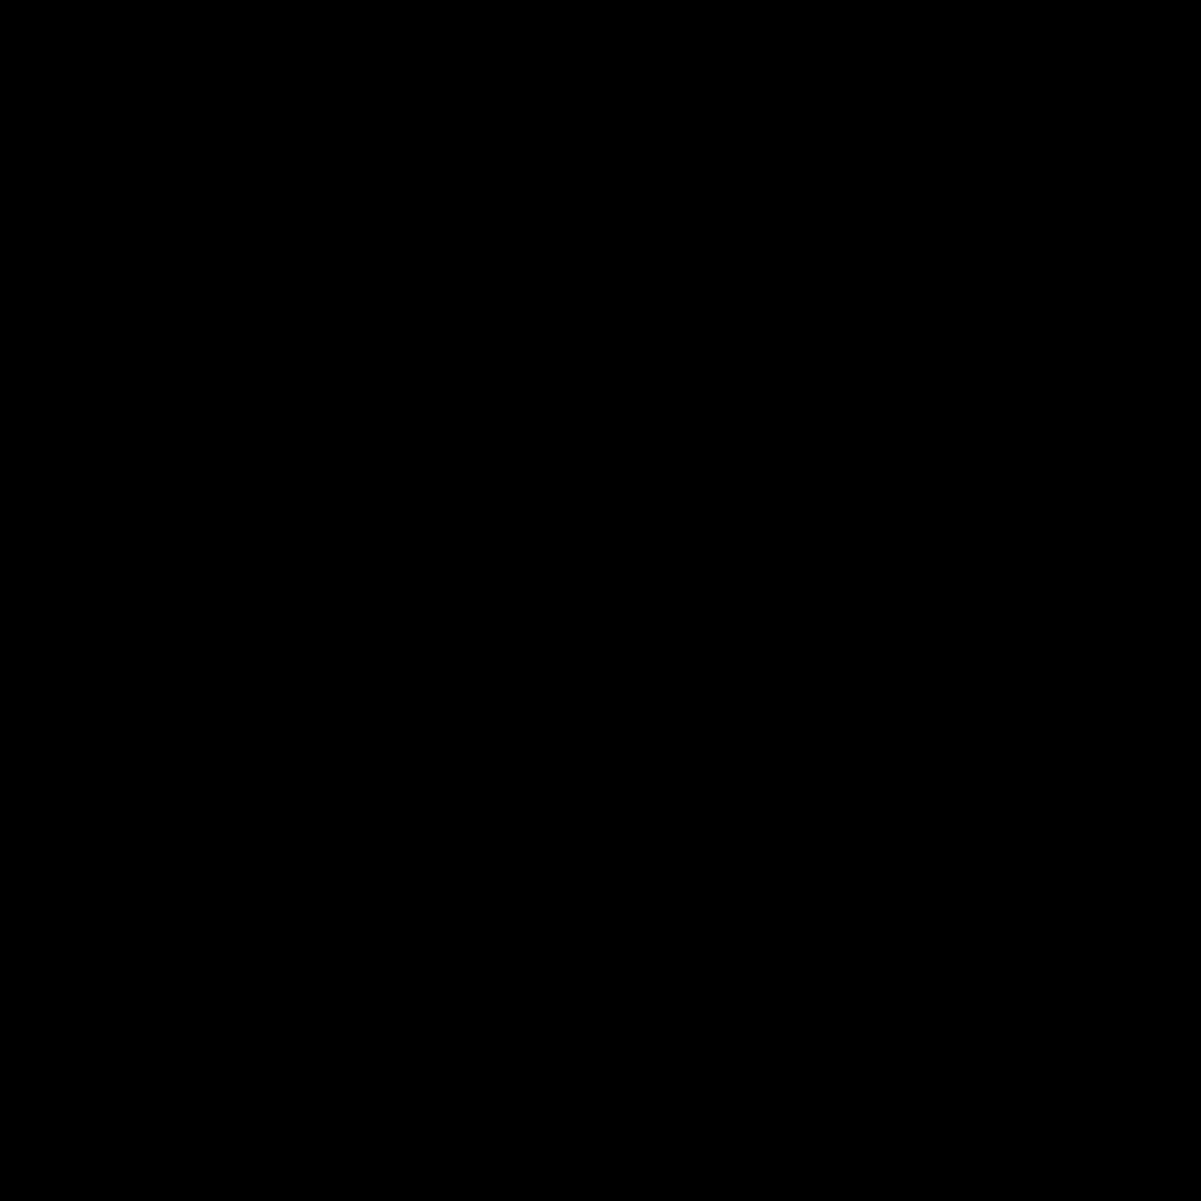 Meristem-Alternate-Black (1).png